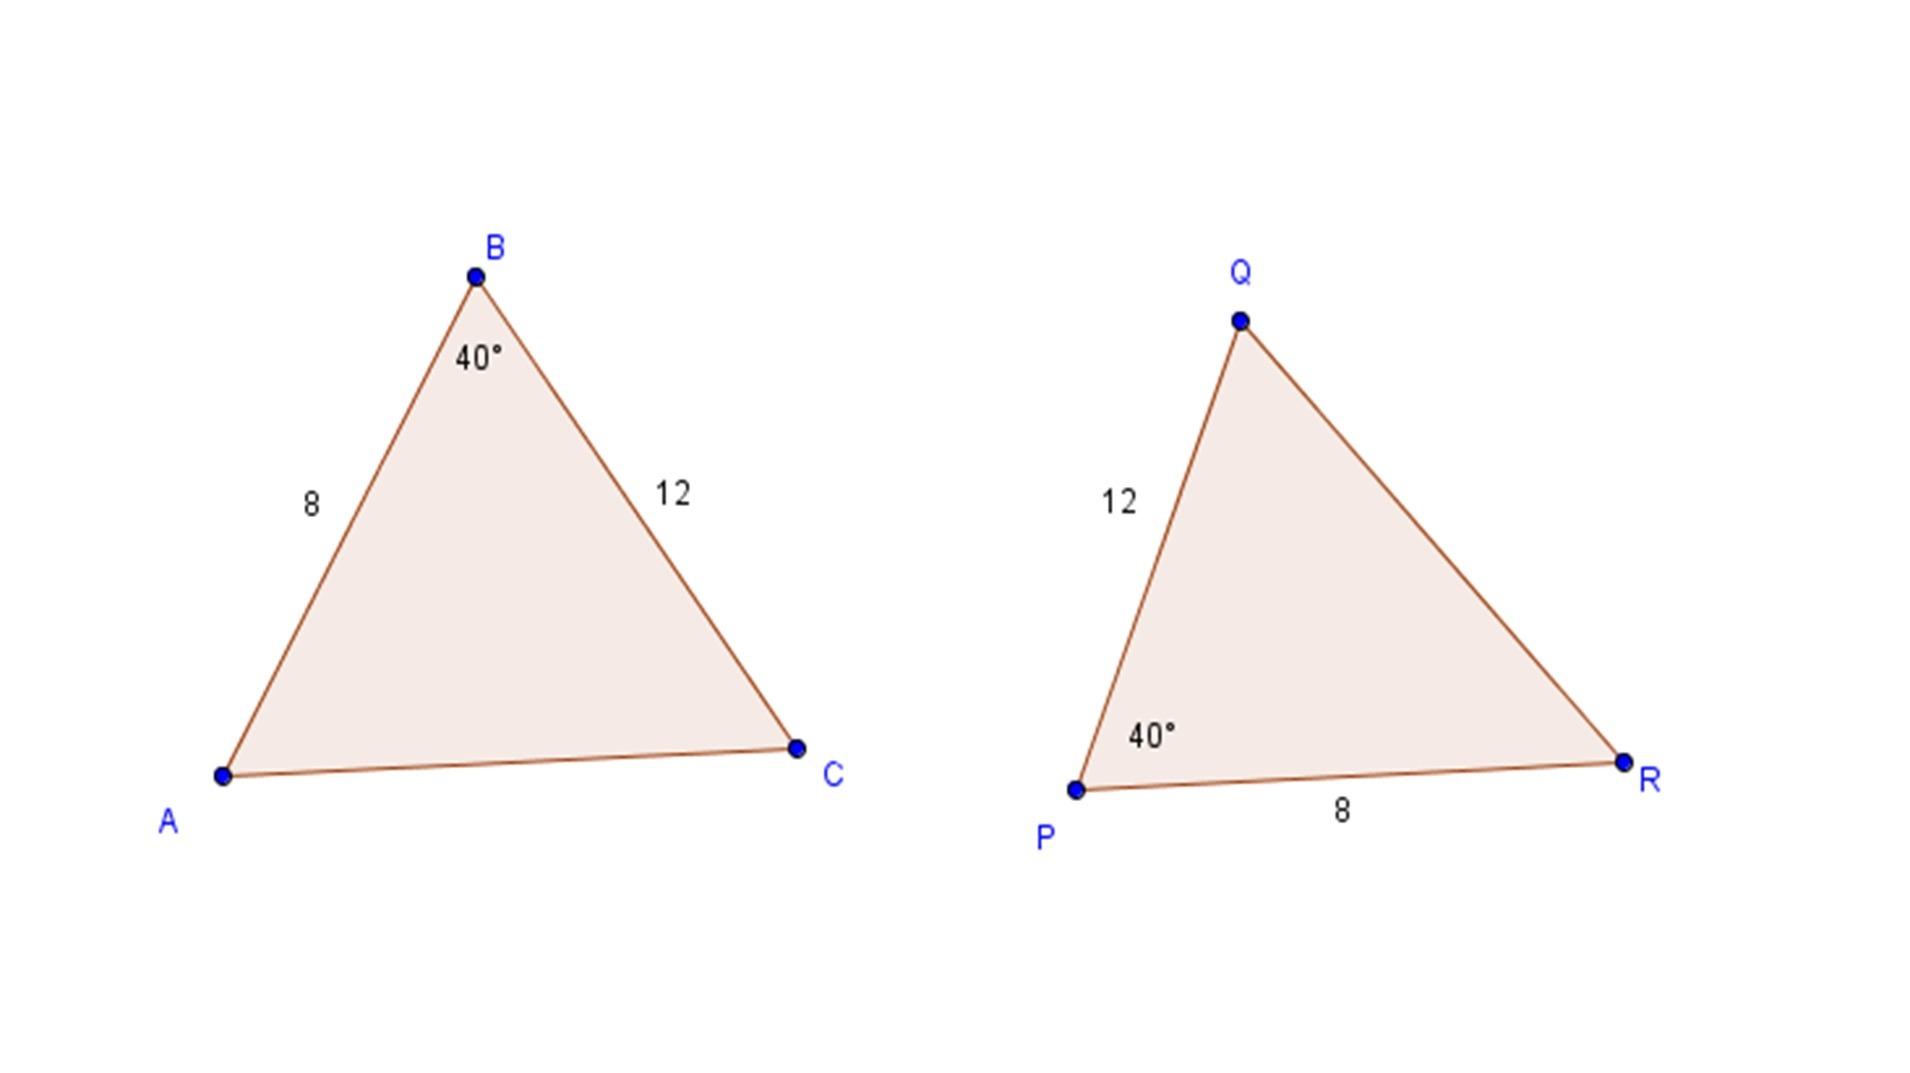 Congruent Triangle Postulates And Right Triangle Congruence